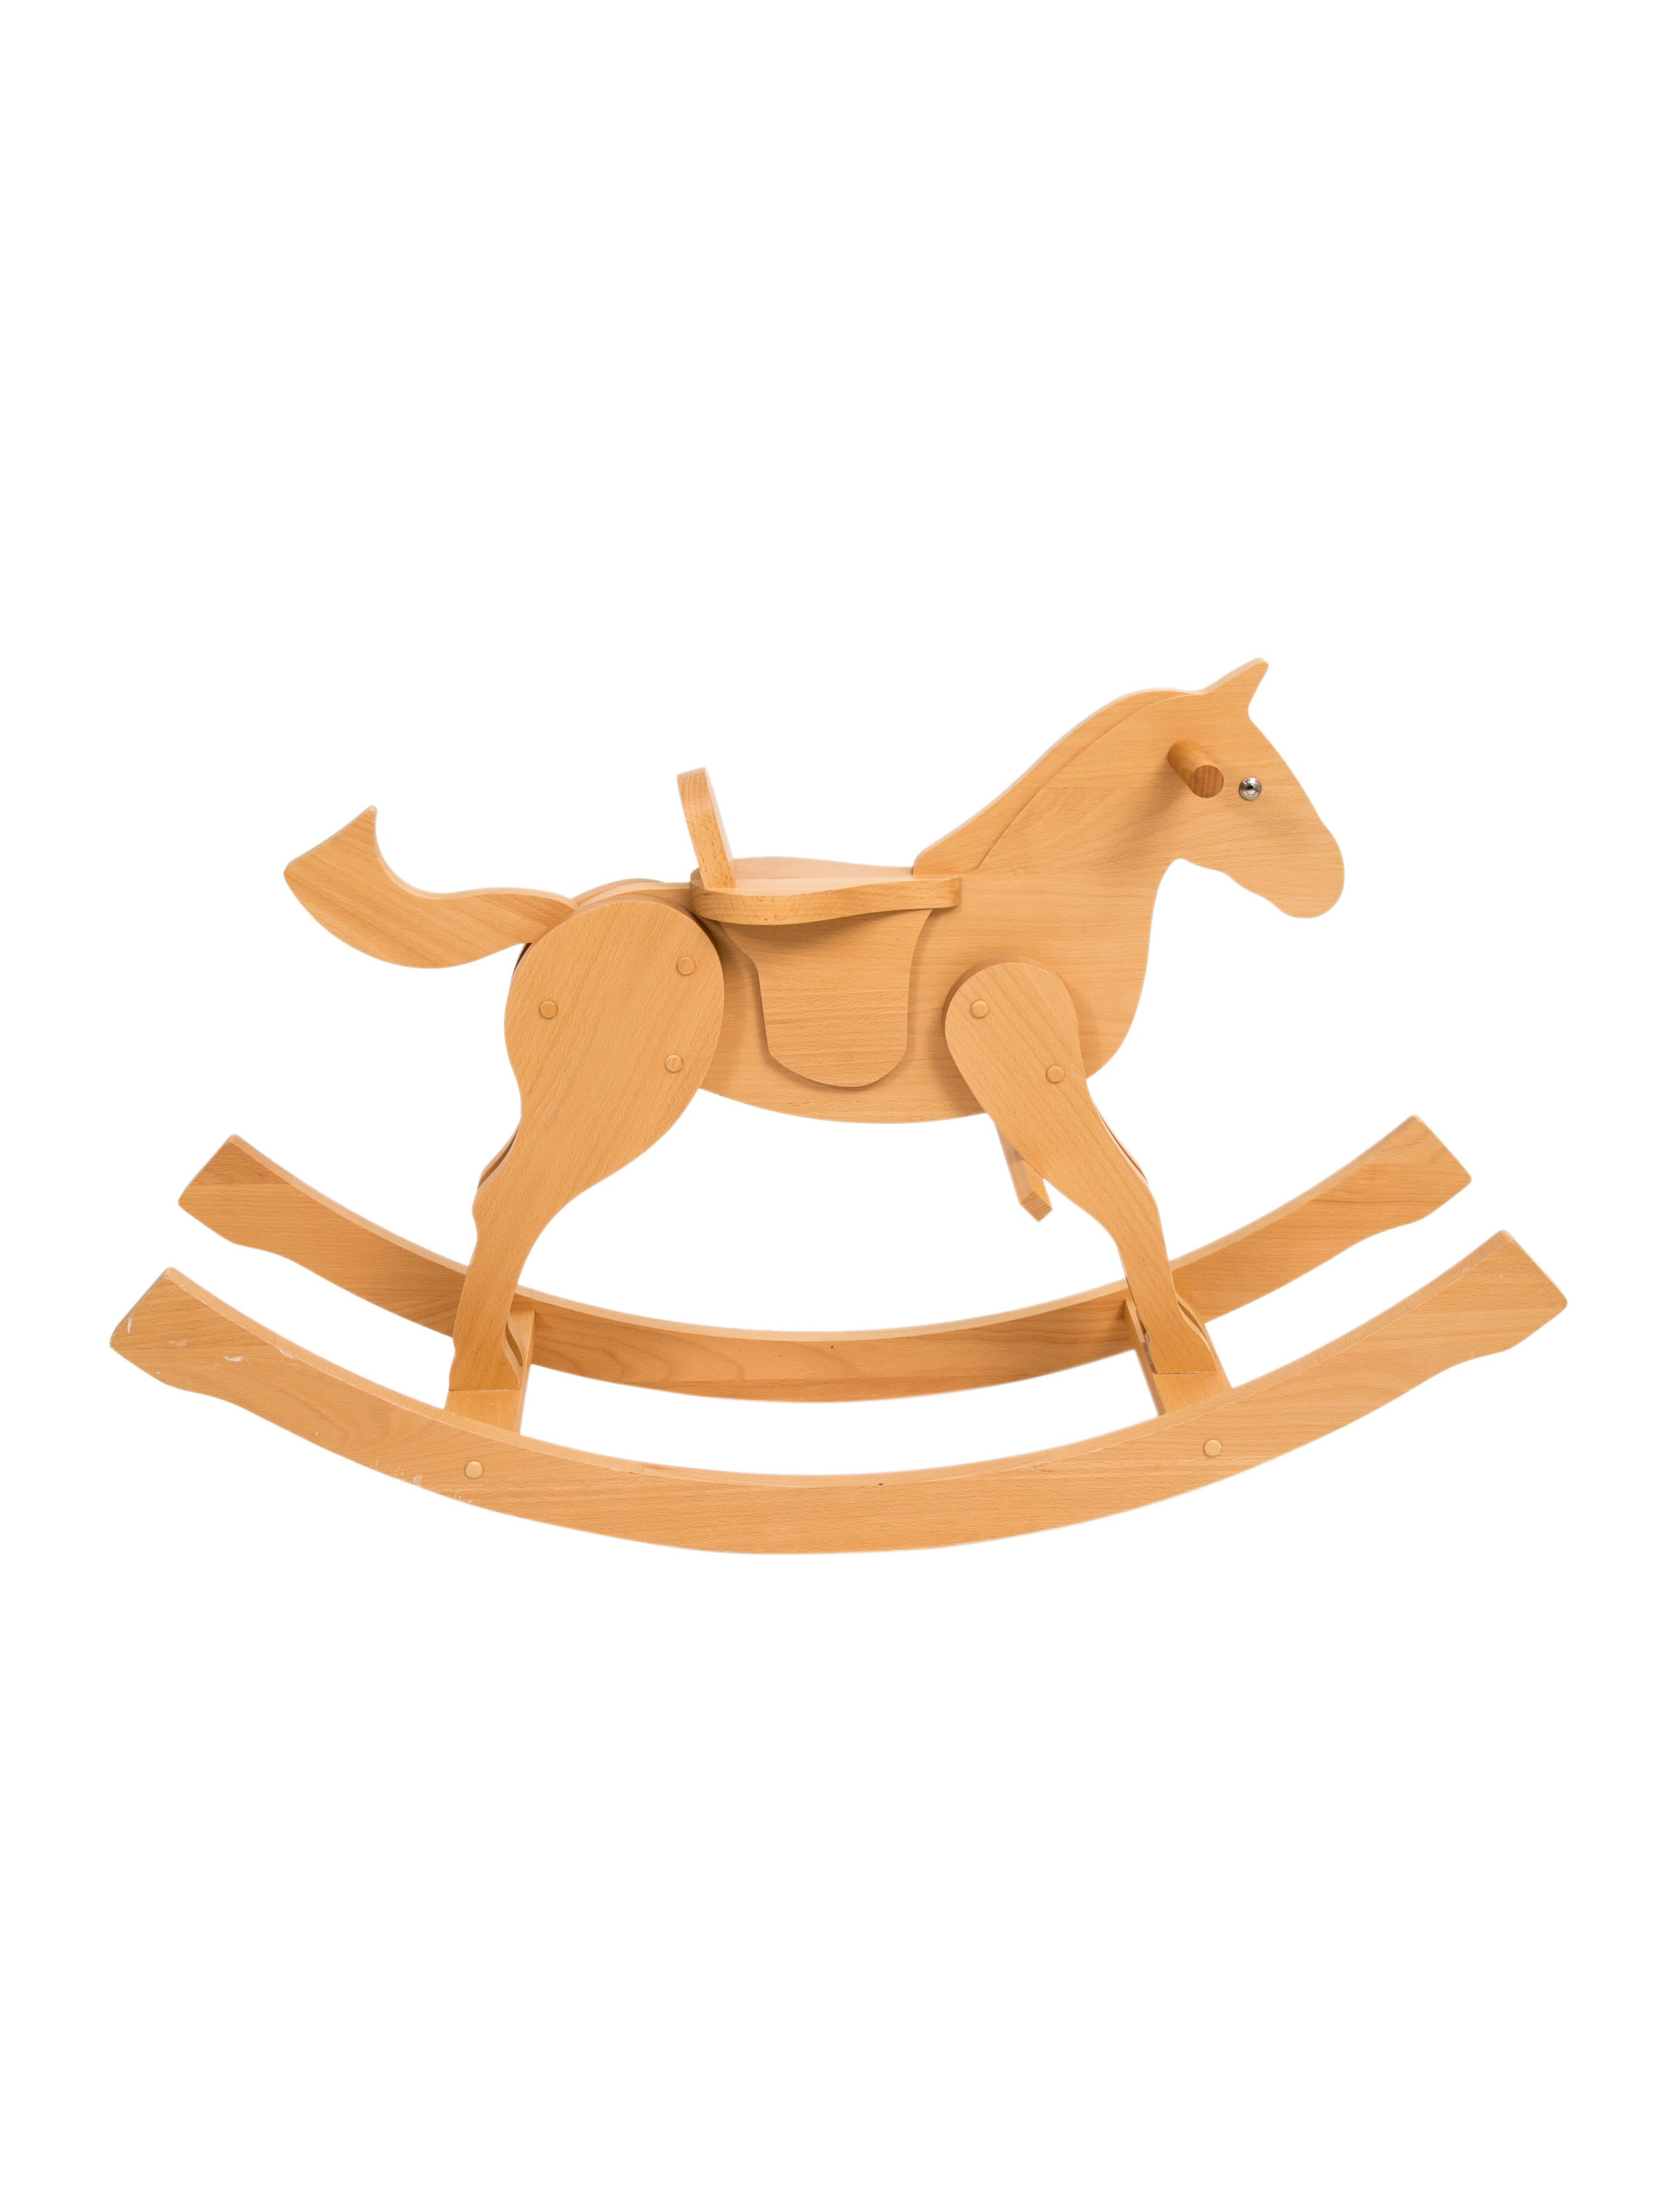 Hermès Beechwood Rocking Horse - Kids Furniture & Accessories